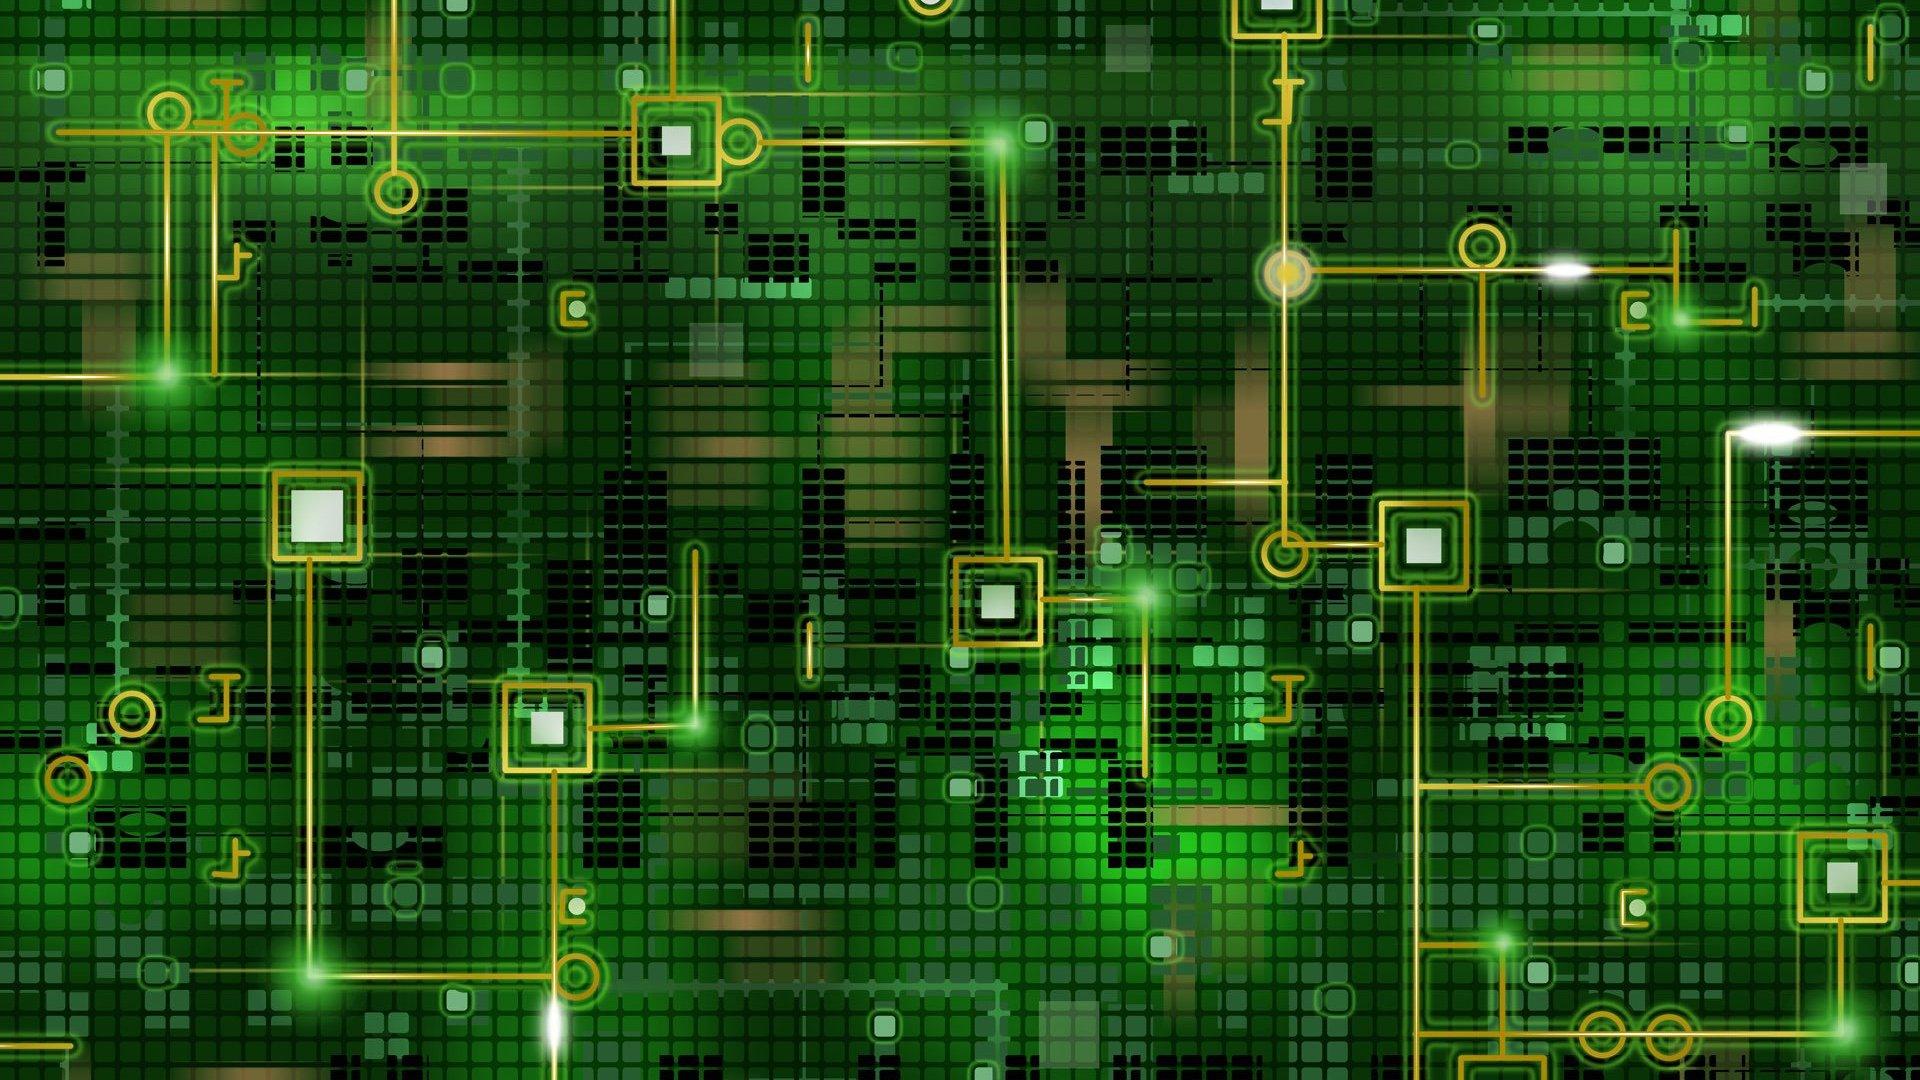 Hd Wallpapers For Pc Quotes Matrix Wallpapers Hd Pixelstalk Net